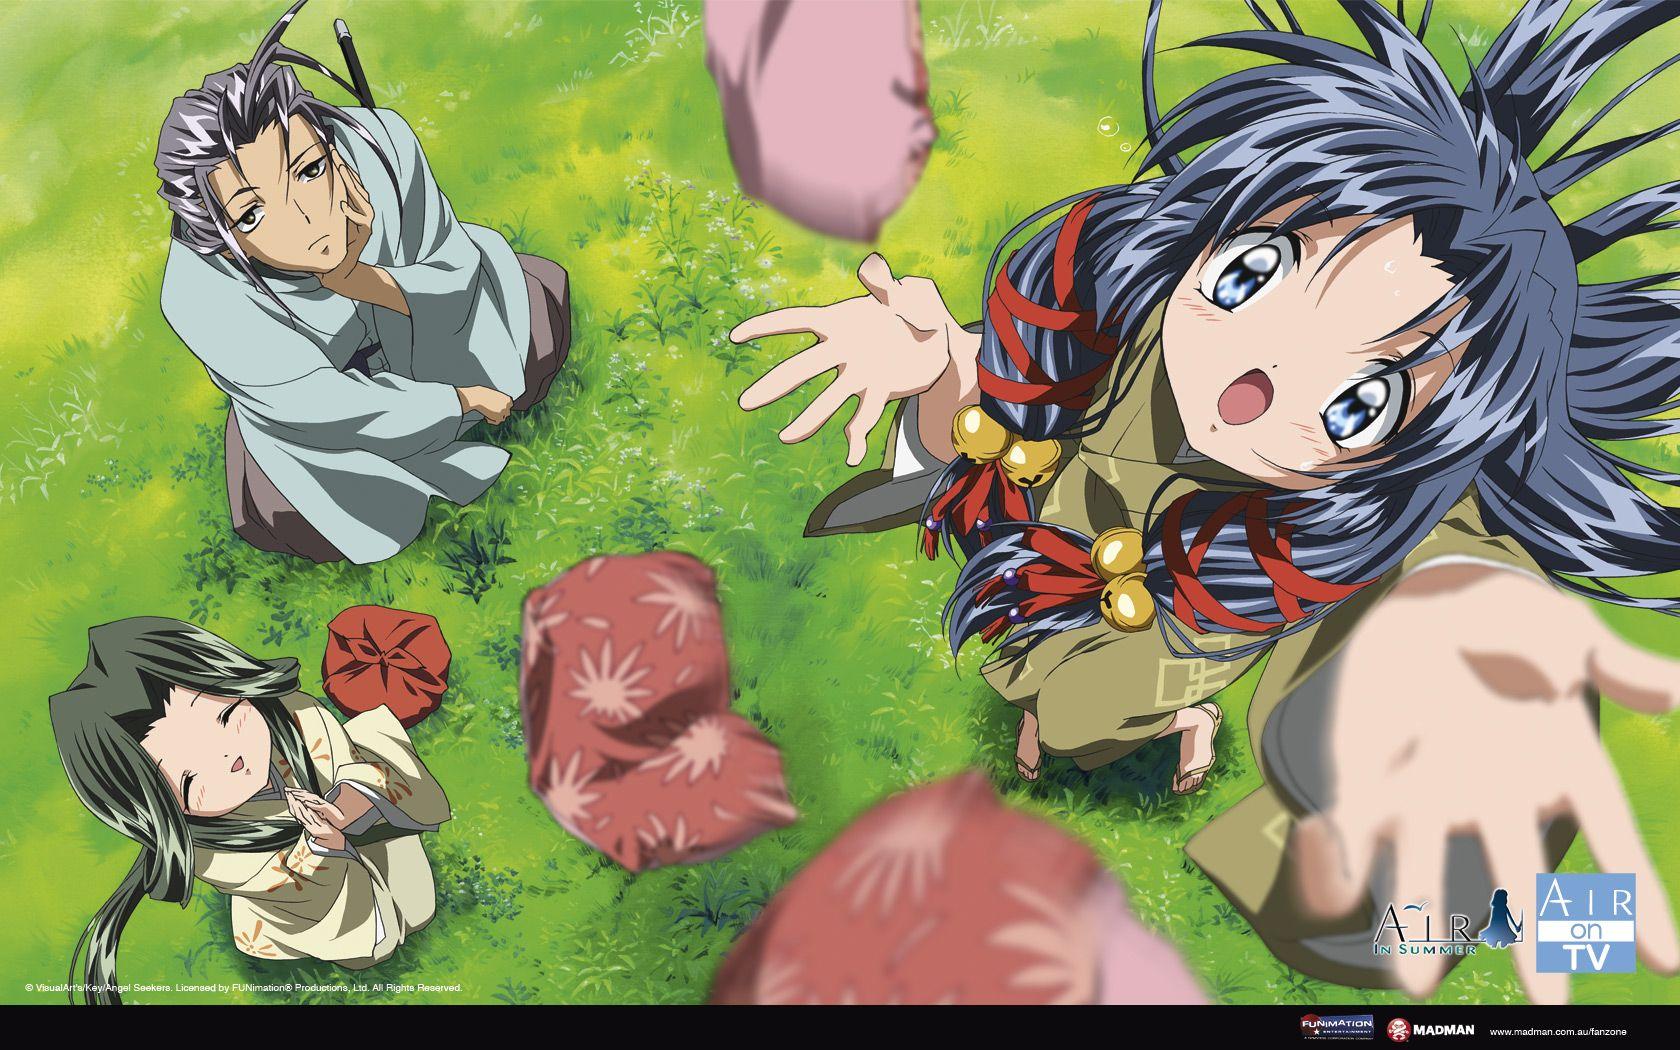 air tv anime Google Search Anime, Kyoto animation, Air